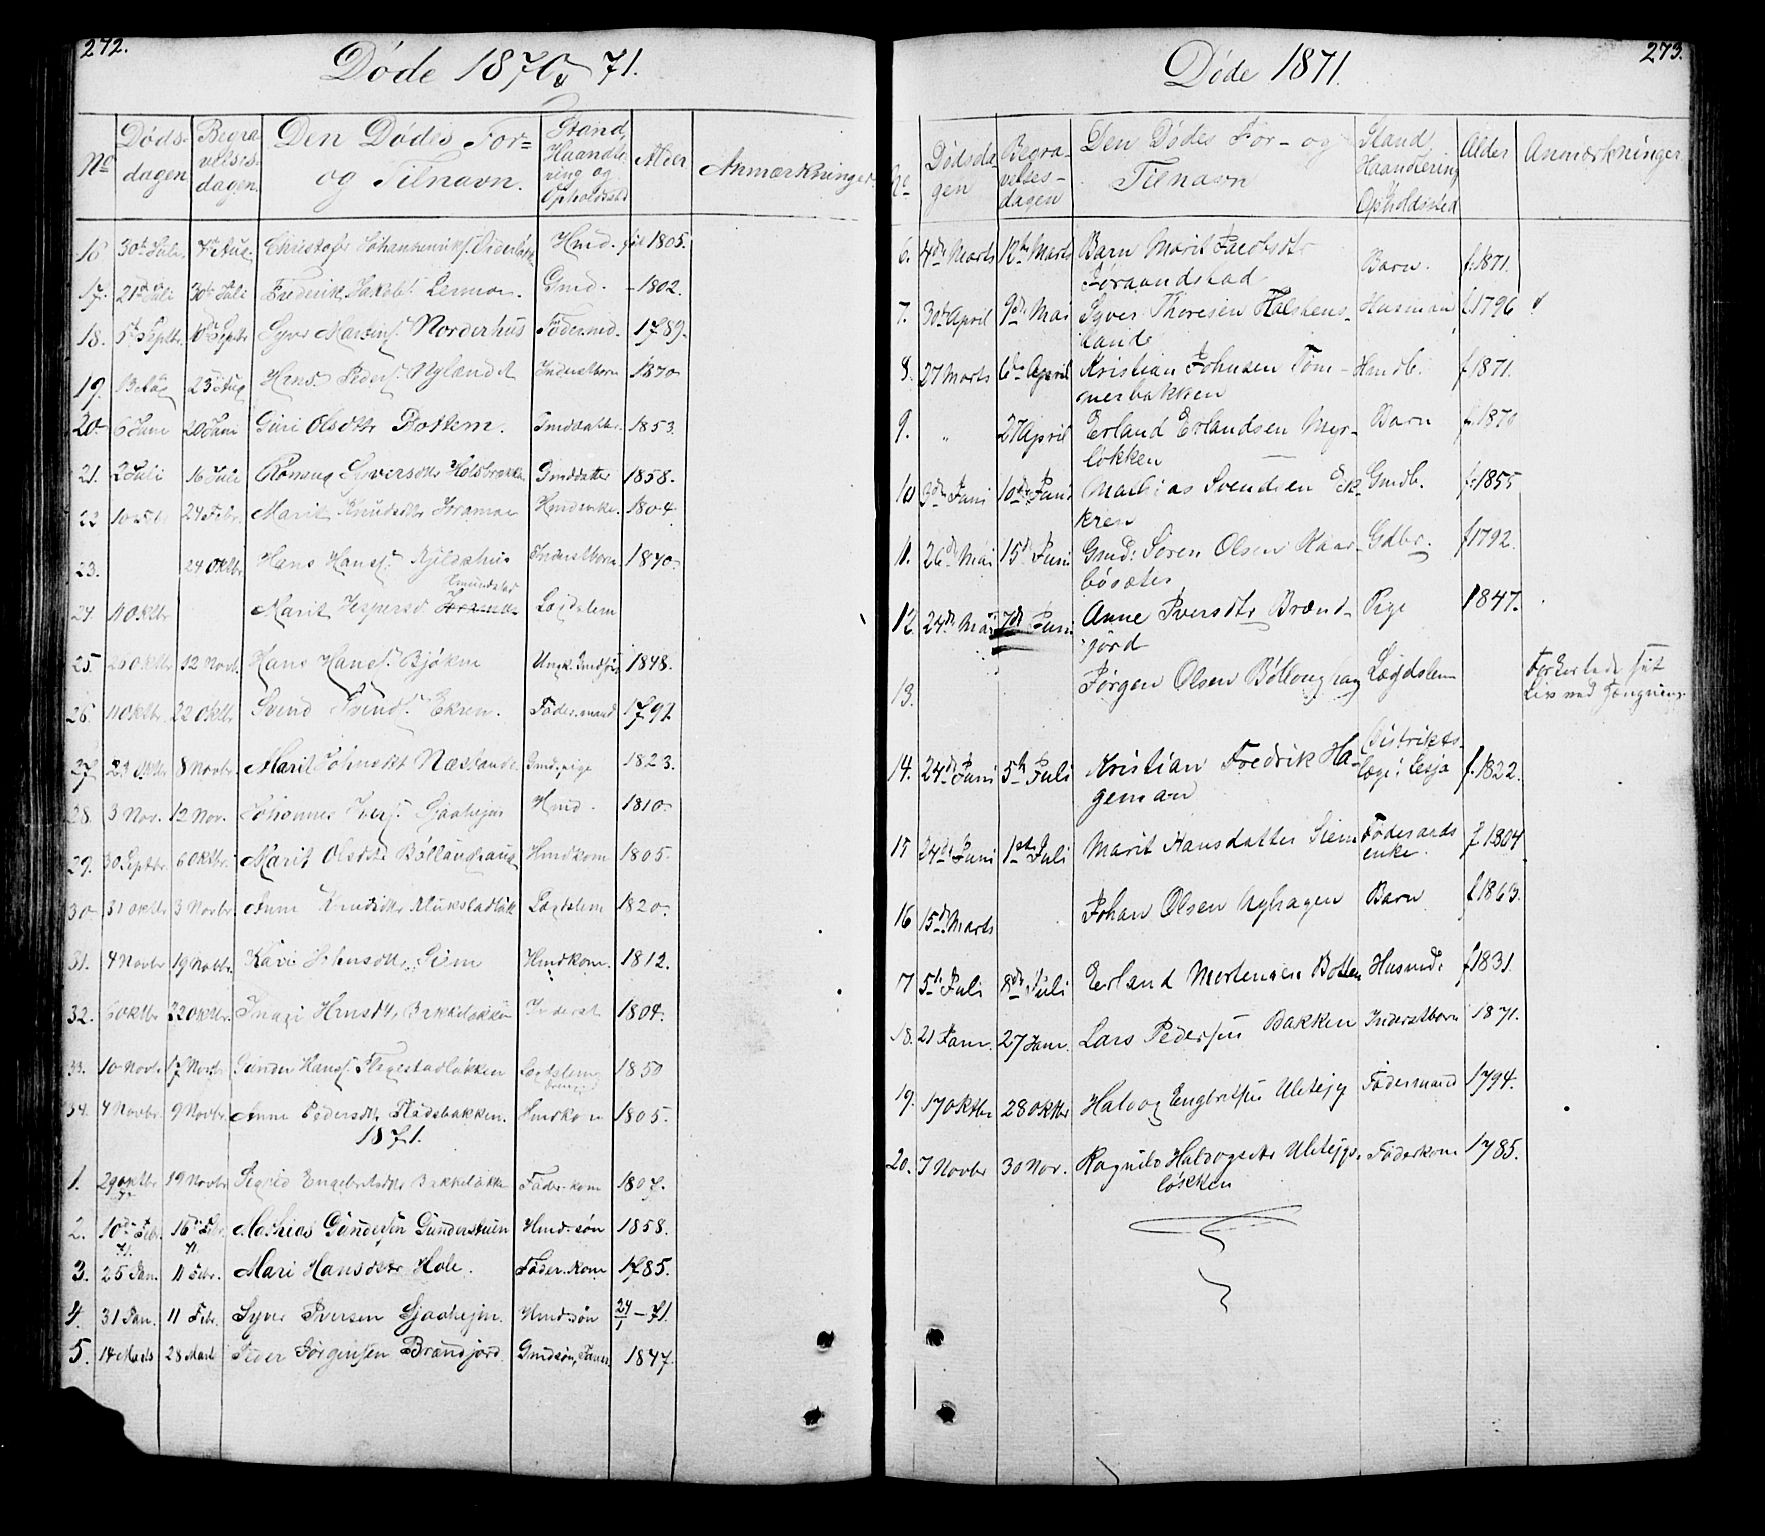 SAH, Lesja prestekontor, Klokkerbok nr. 5, 1850-1894, s. 272-273